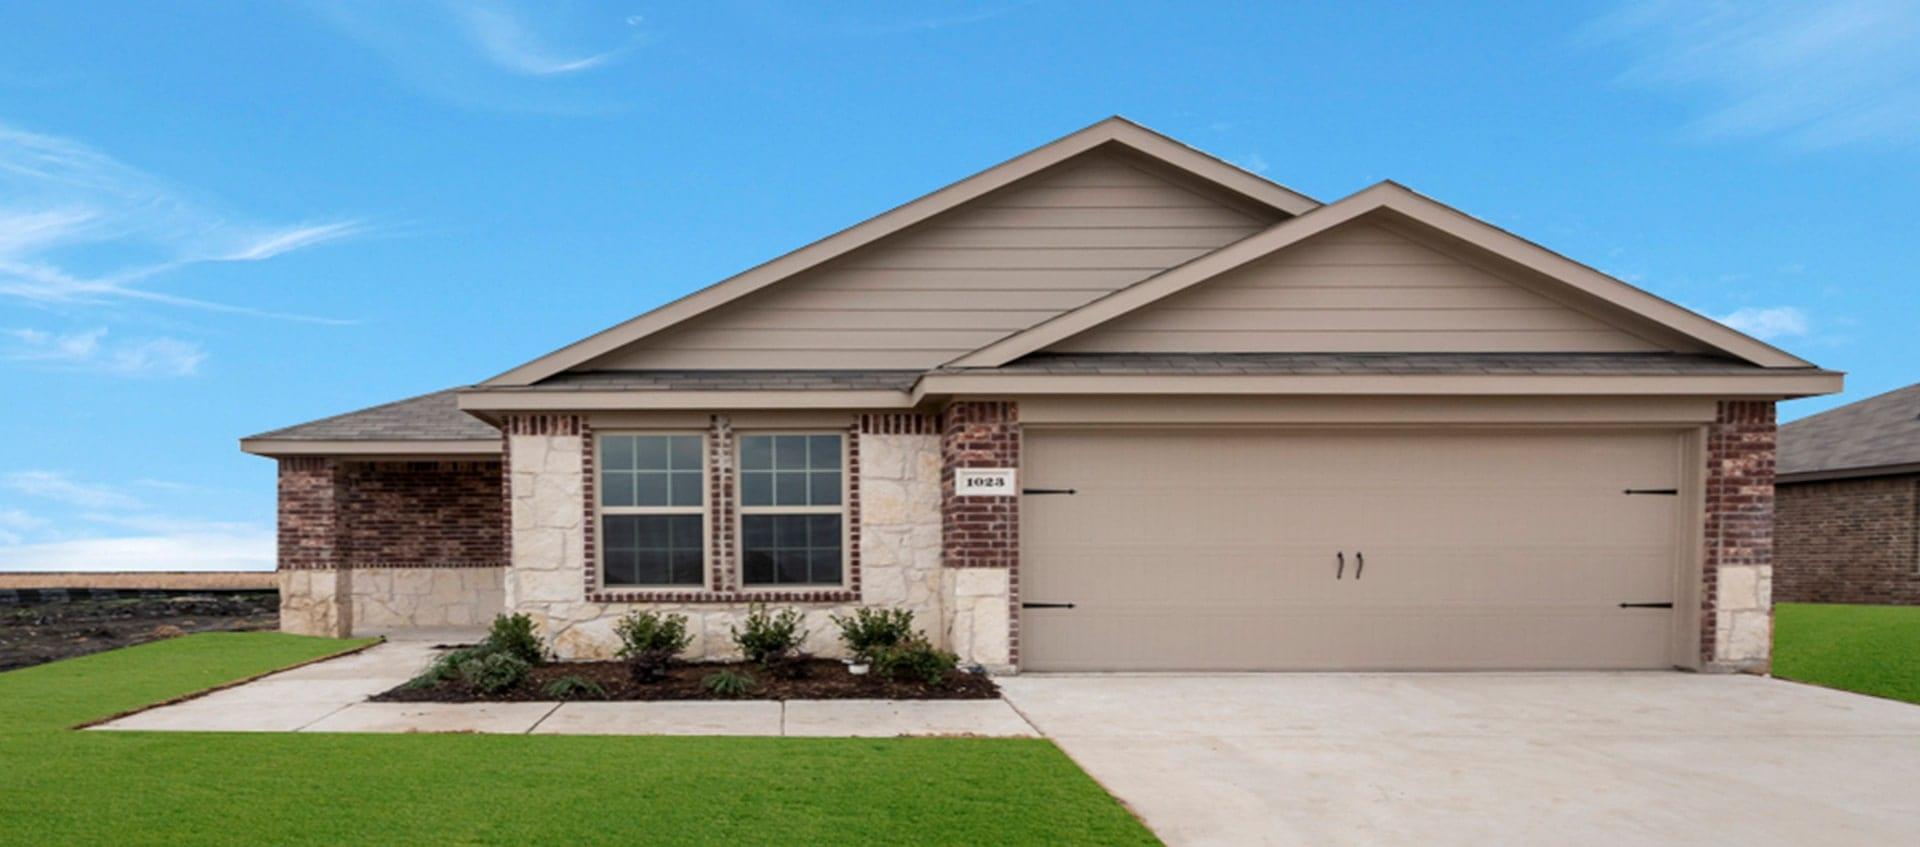 Express Homes Model at Wildcat Ranch Crandall Texas